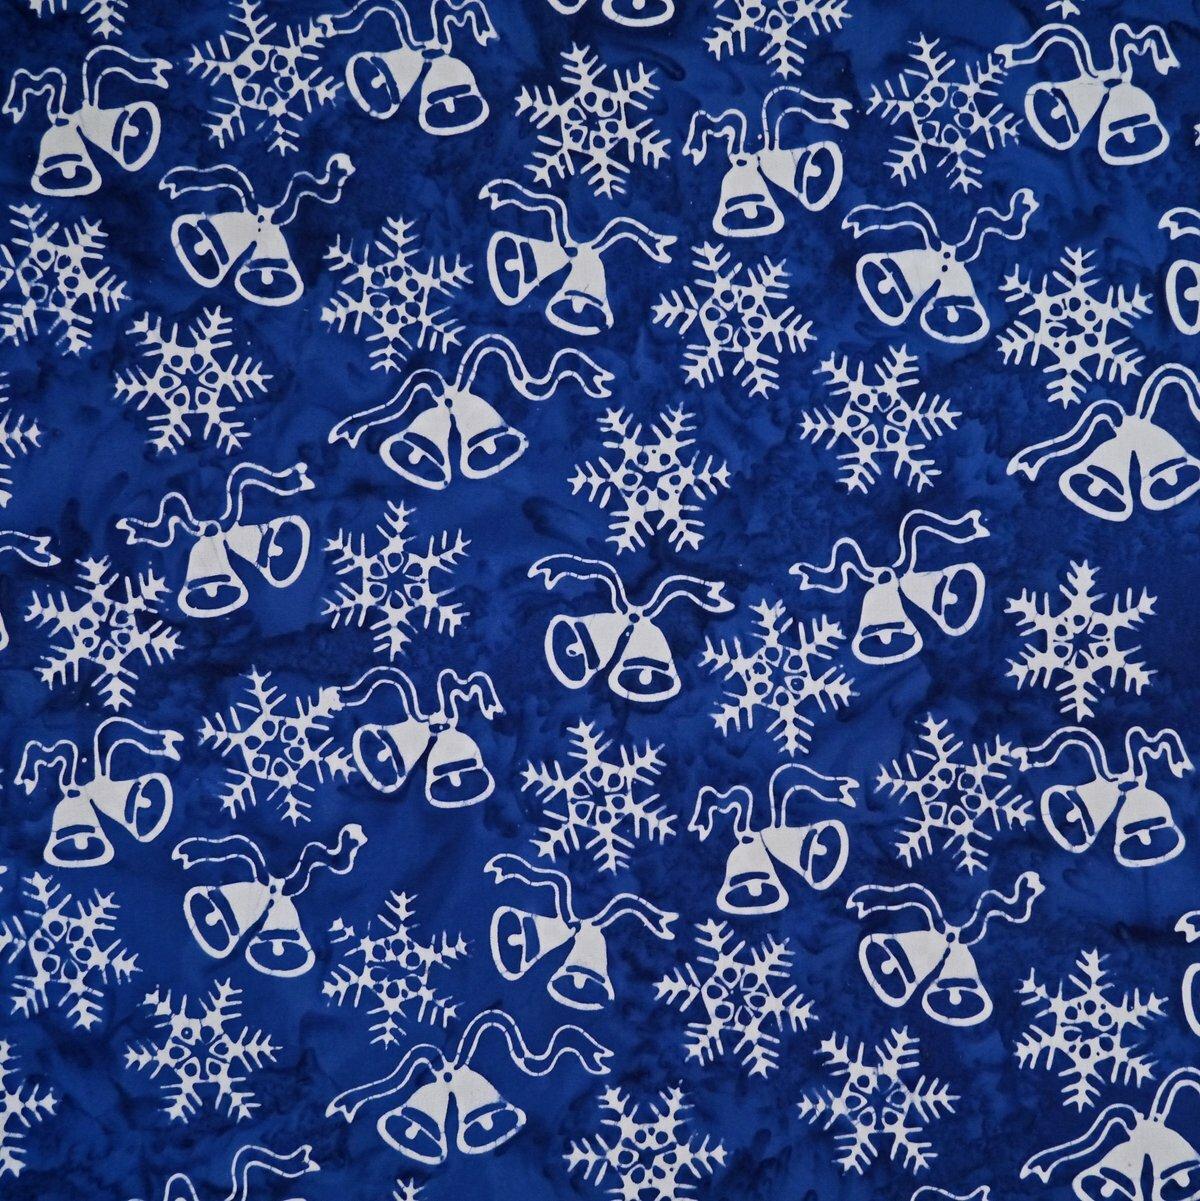 Niagara - Winter Twine - Batik - 1/2m cut 56265